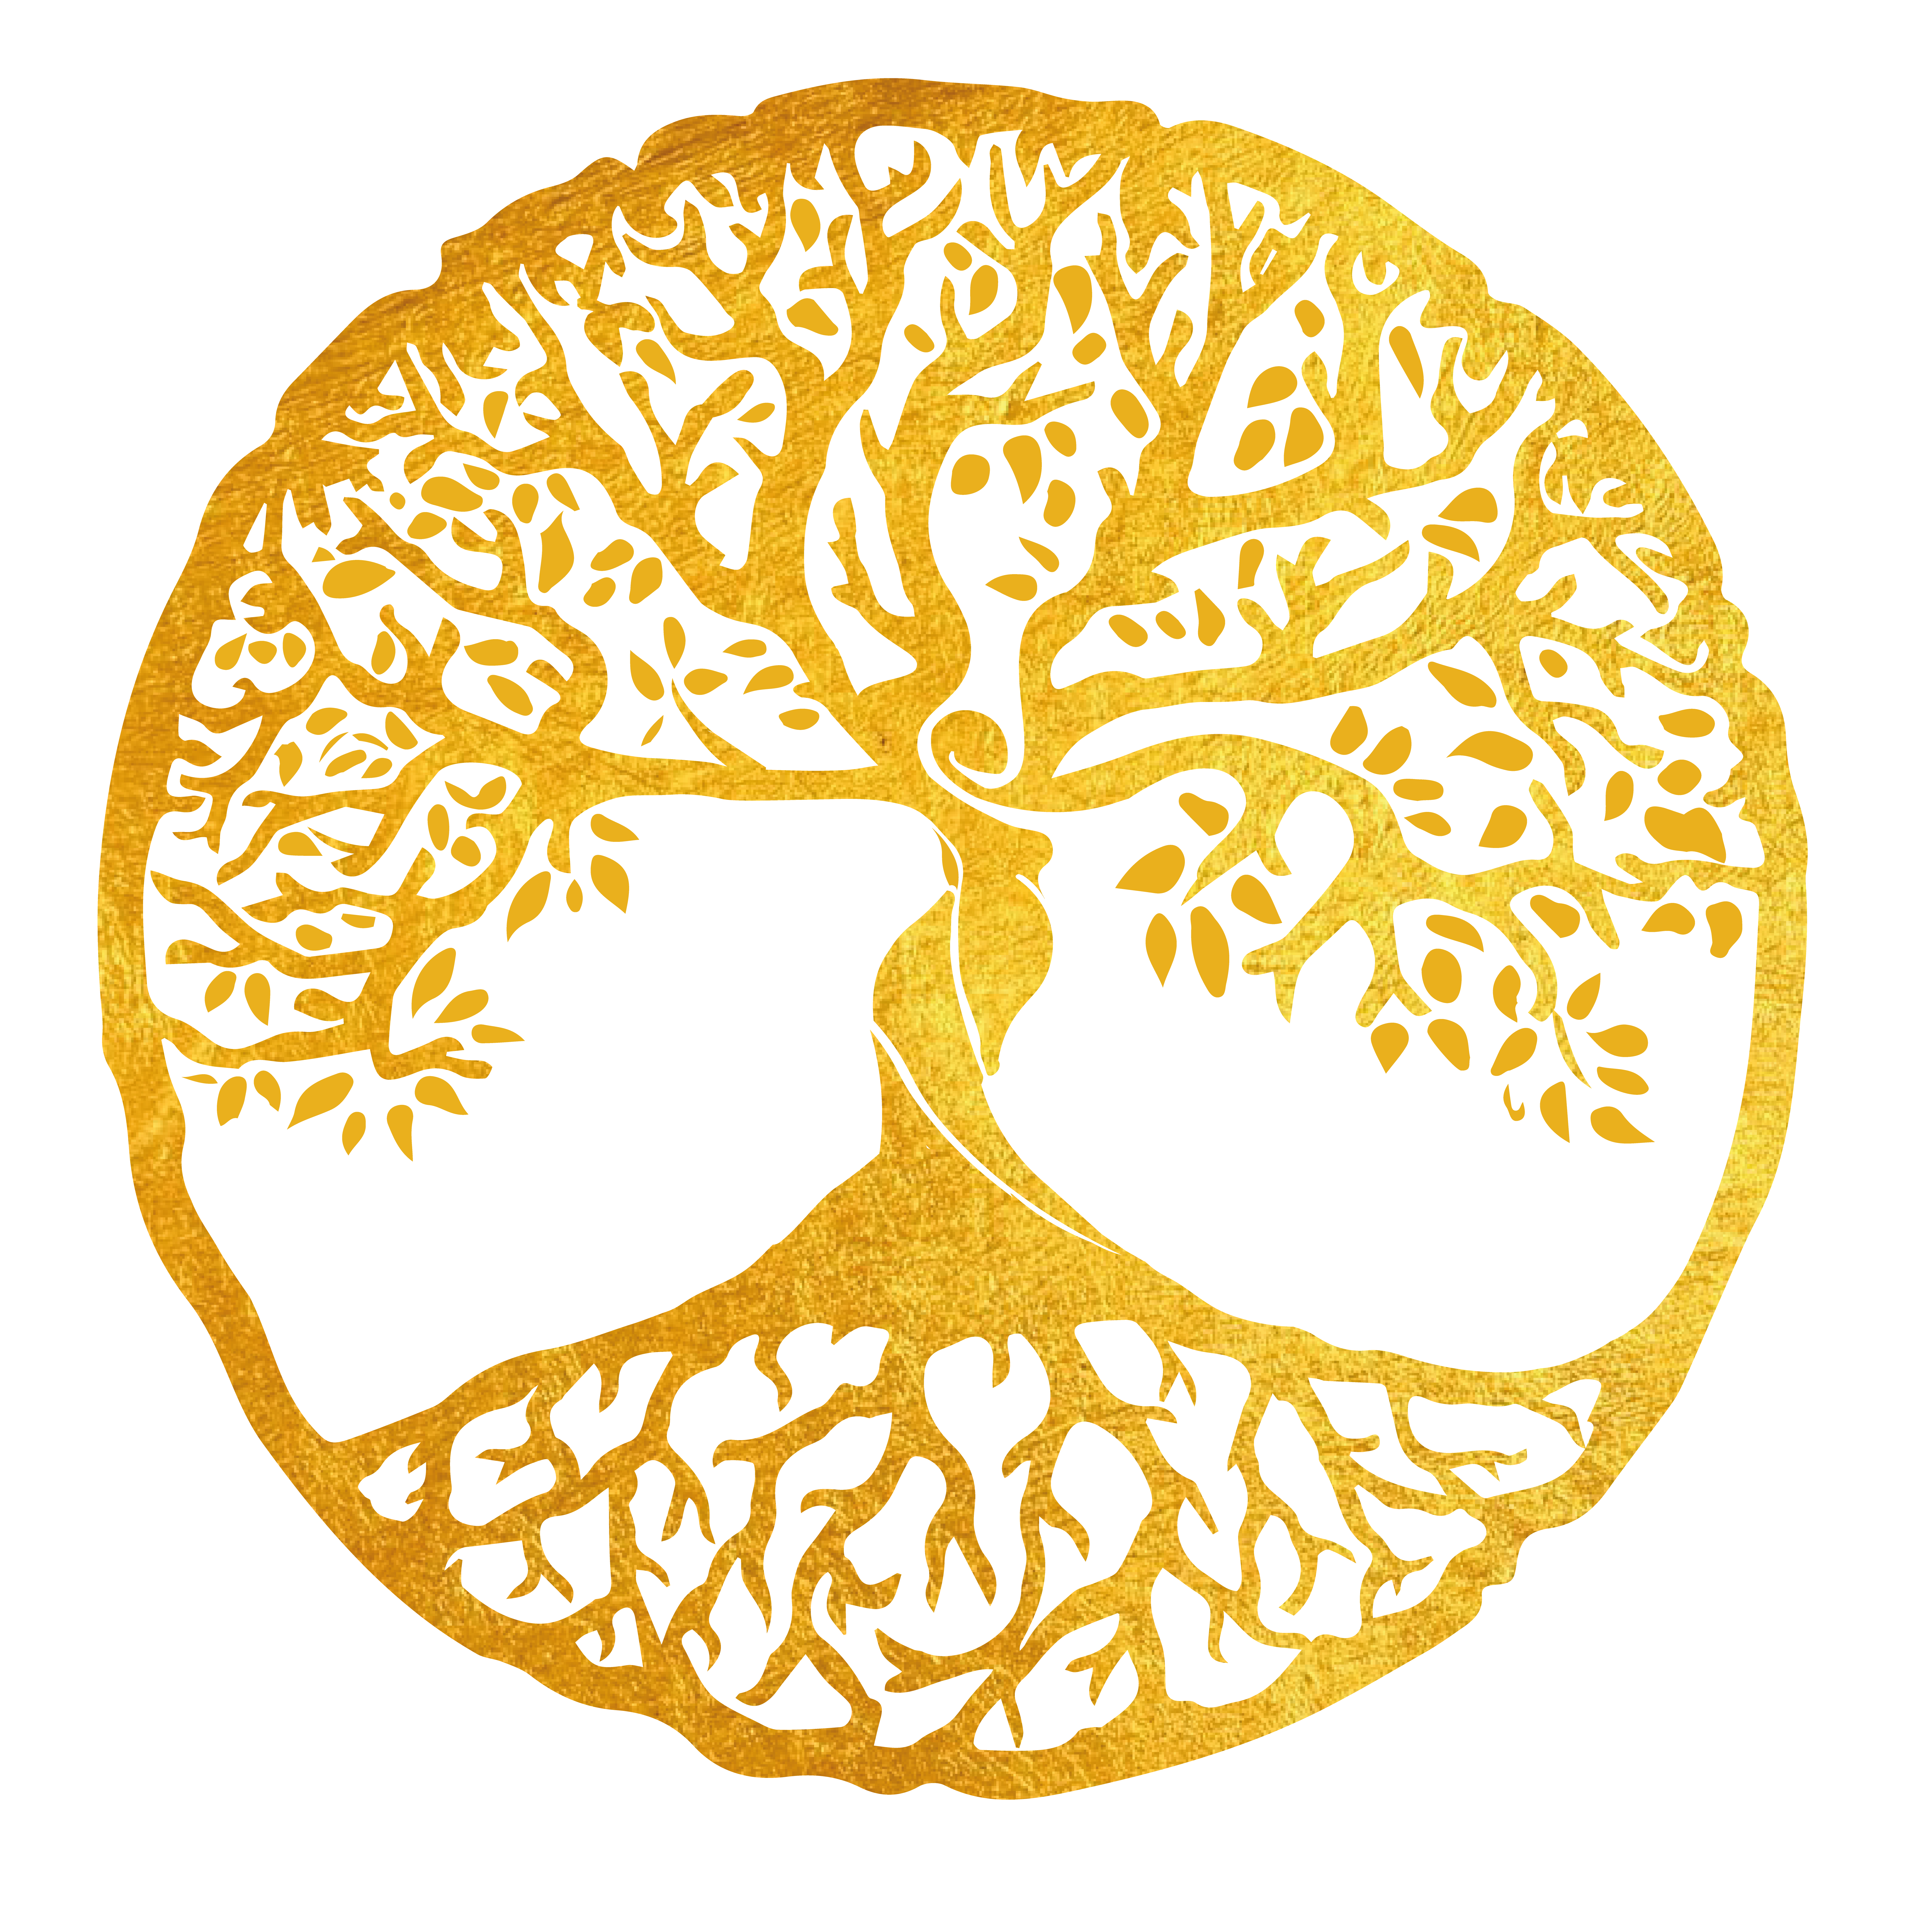 sérénité parentalité logo